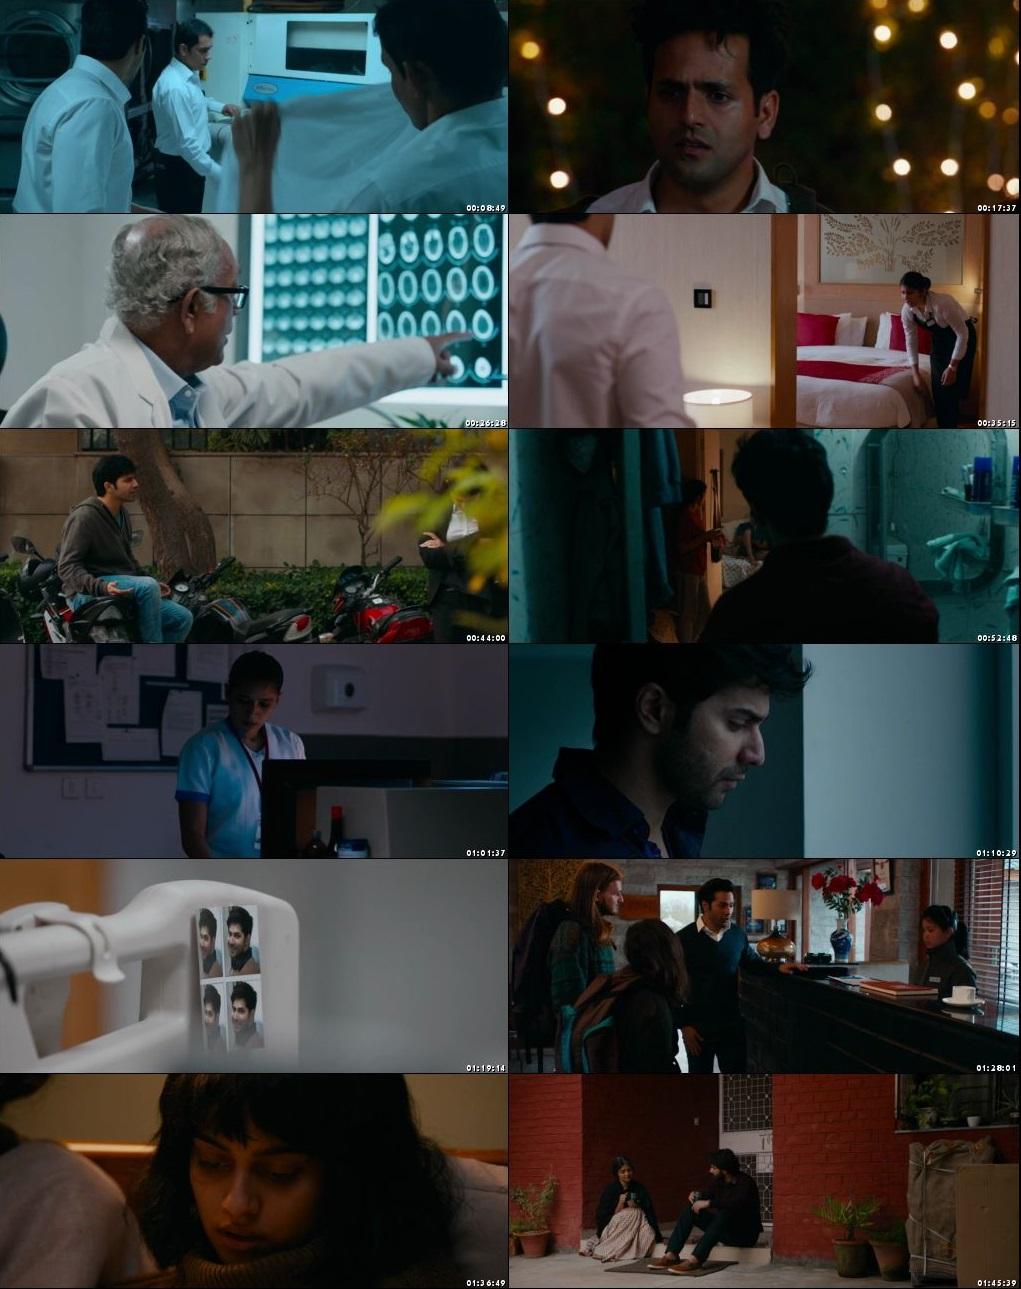 October 2018 Full Movie Download 720p HDRip, BluRay, DVDRip, mkv, Mp4 1080p Full Hd